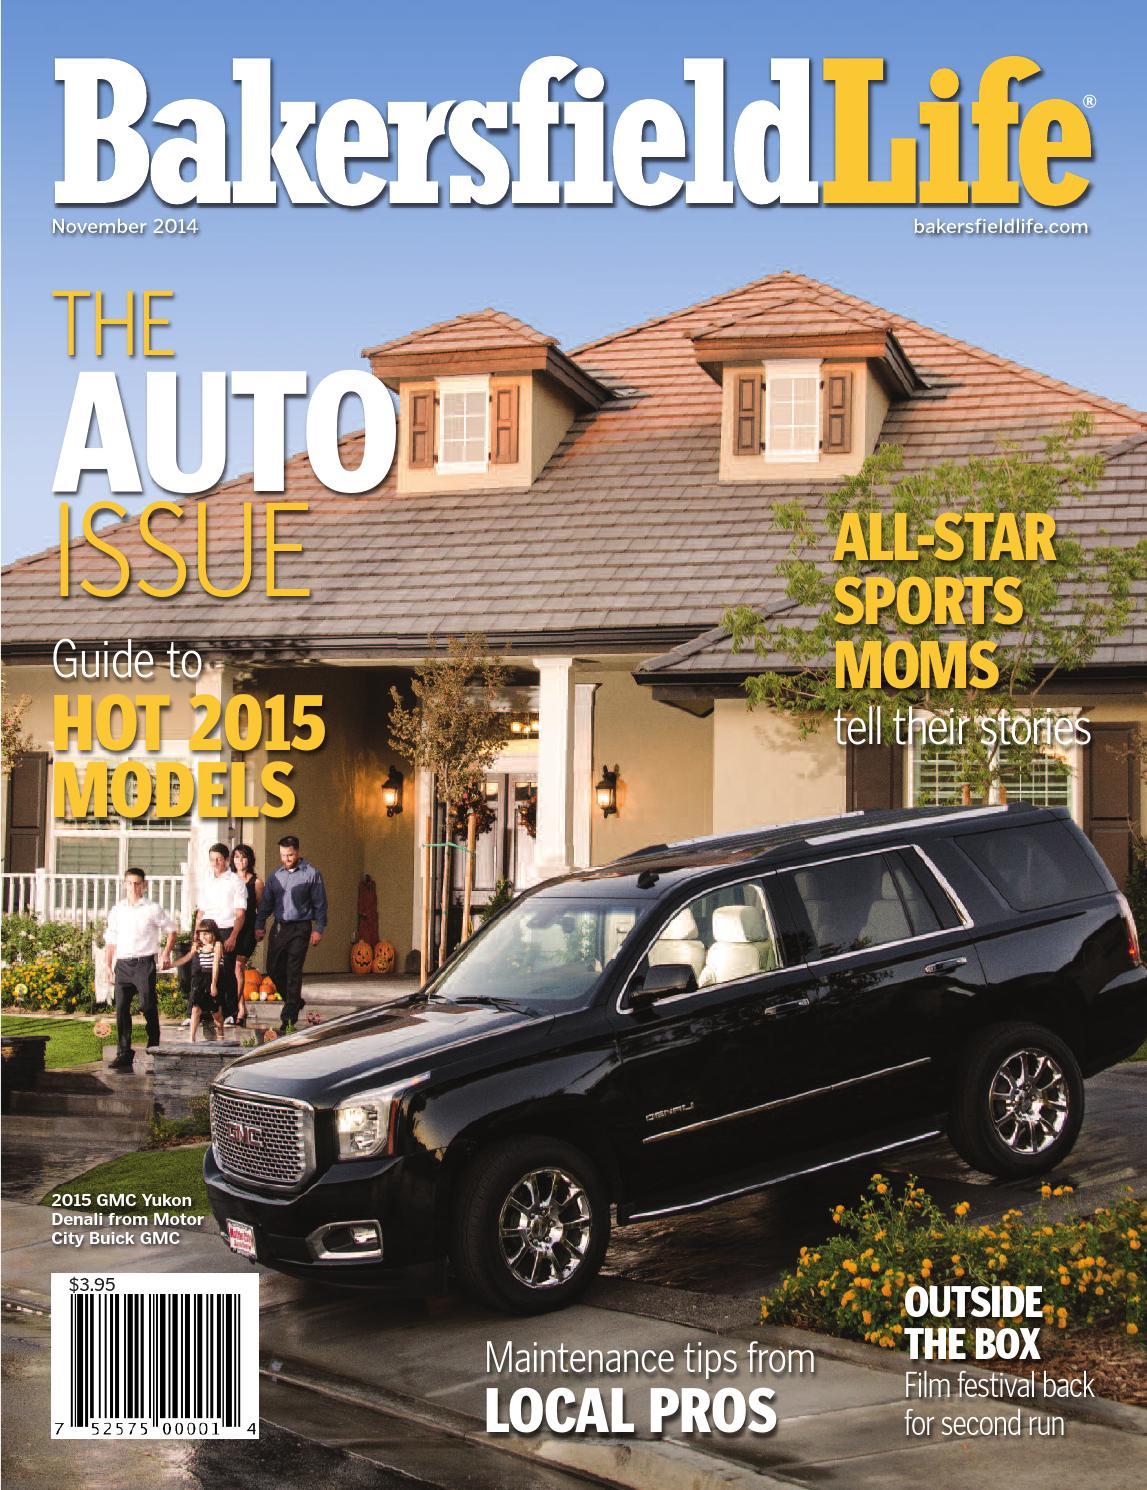 Bakersfield life magazine november 2014 by tbc media for Bakersfield home magazine